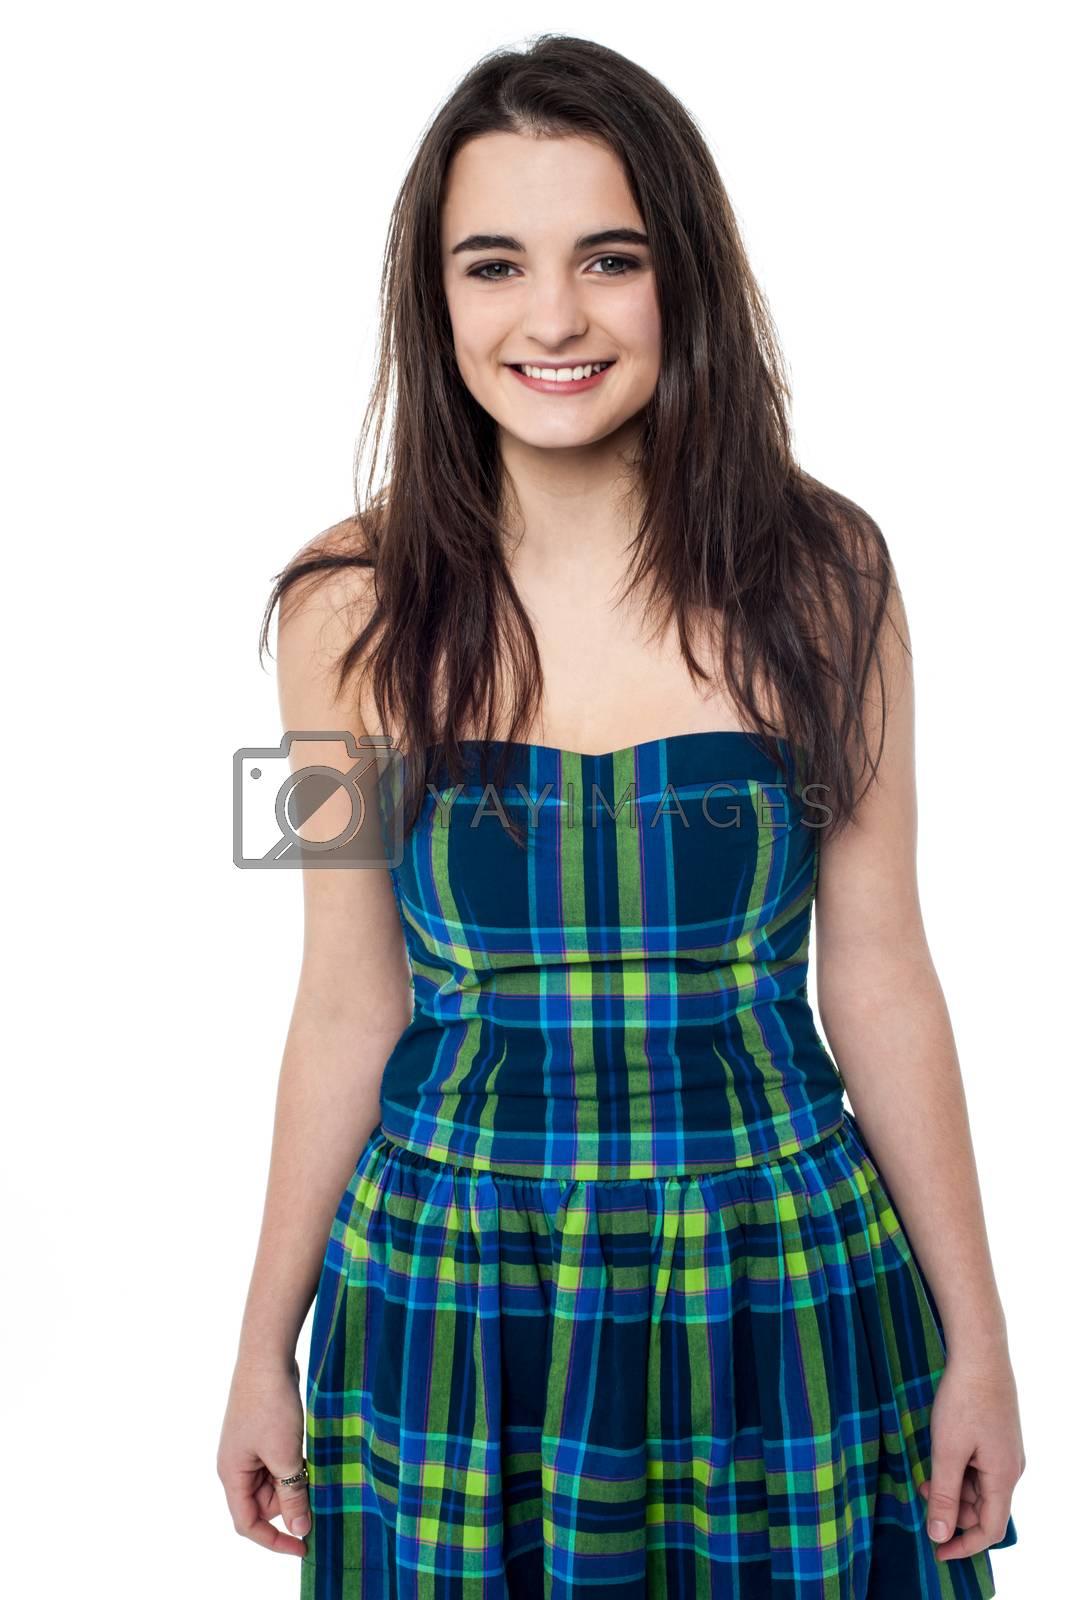 Glamorous happy teen in fashionable attire